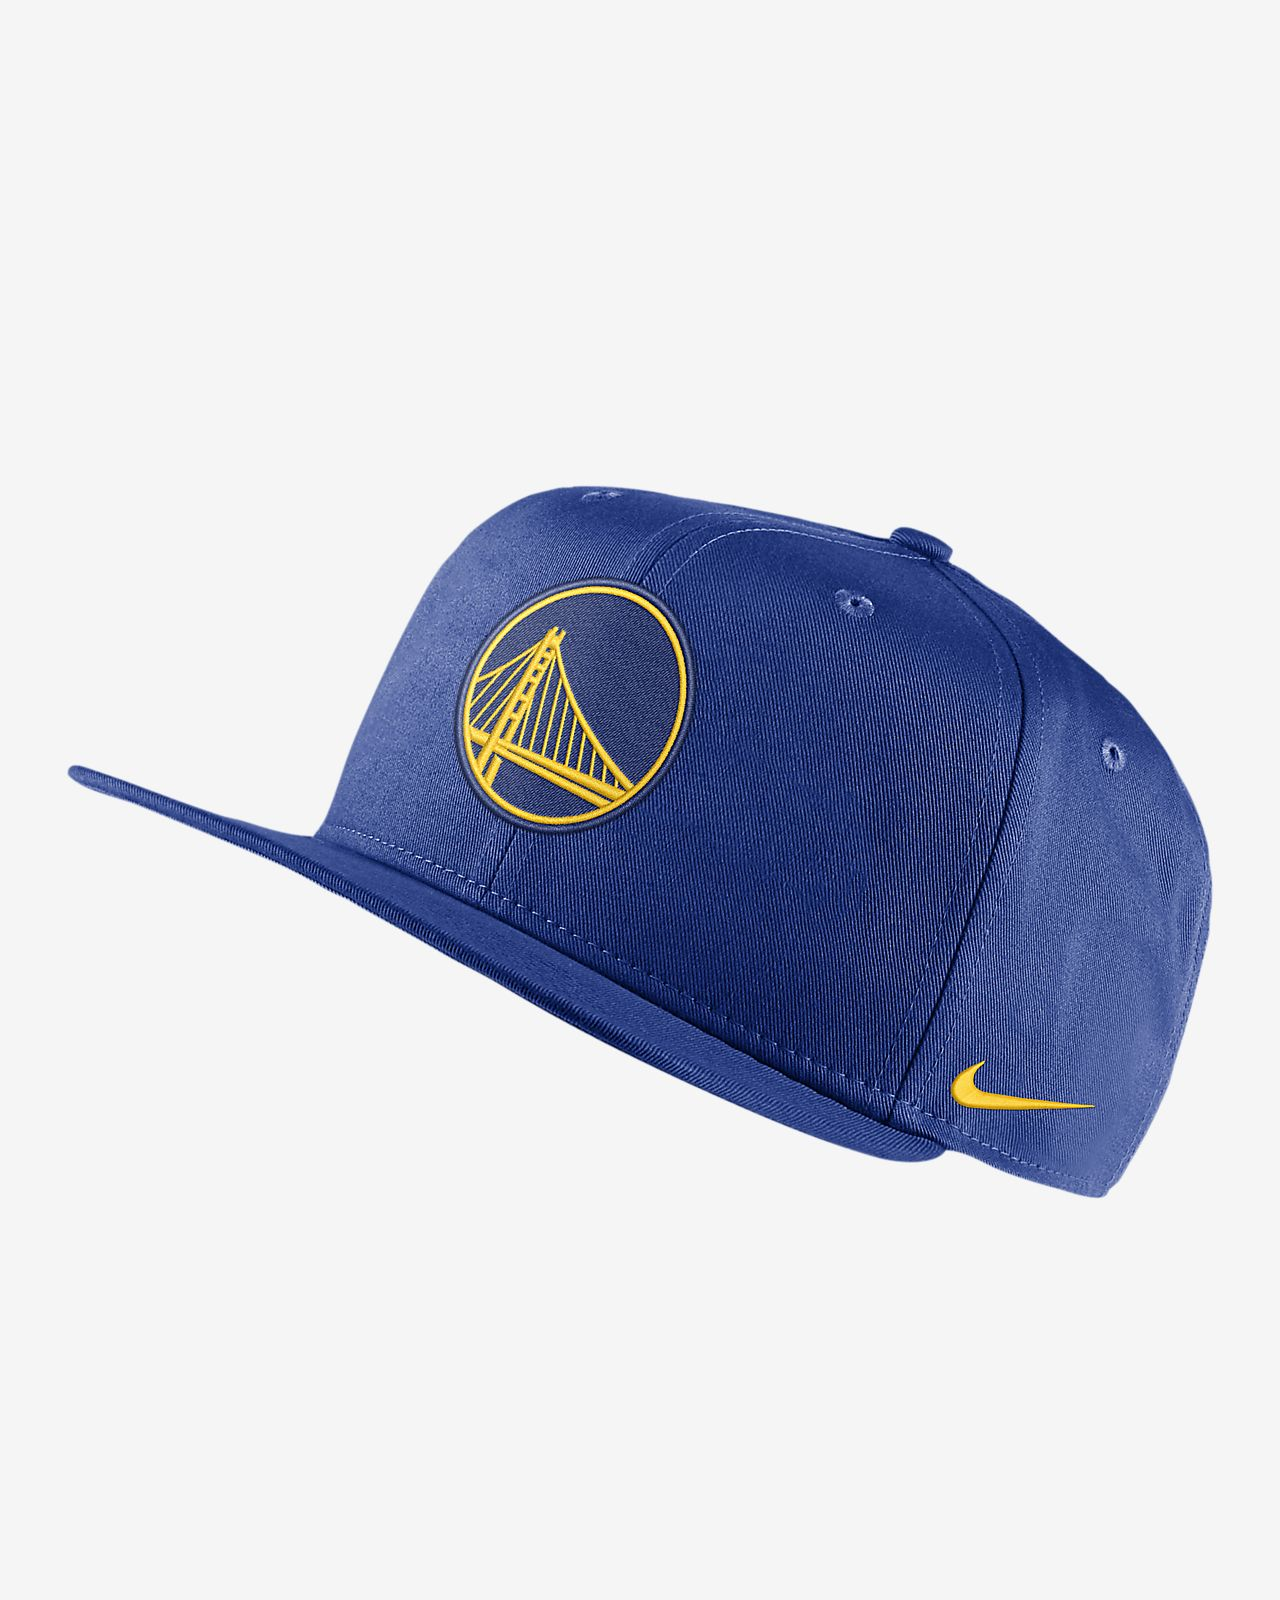 Golden State Warriors Nike Pro NBA sapka